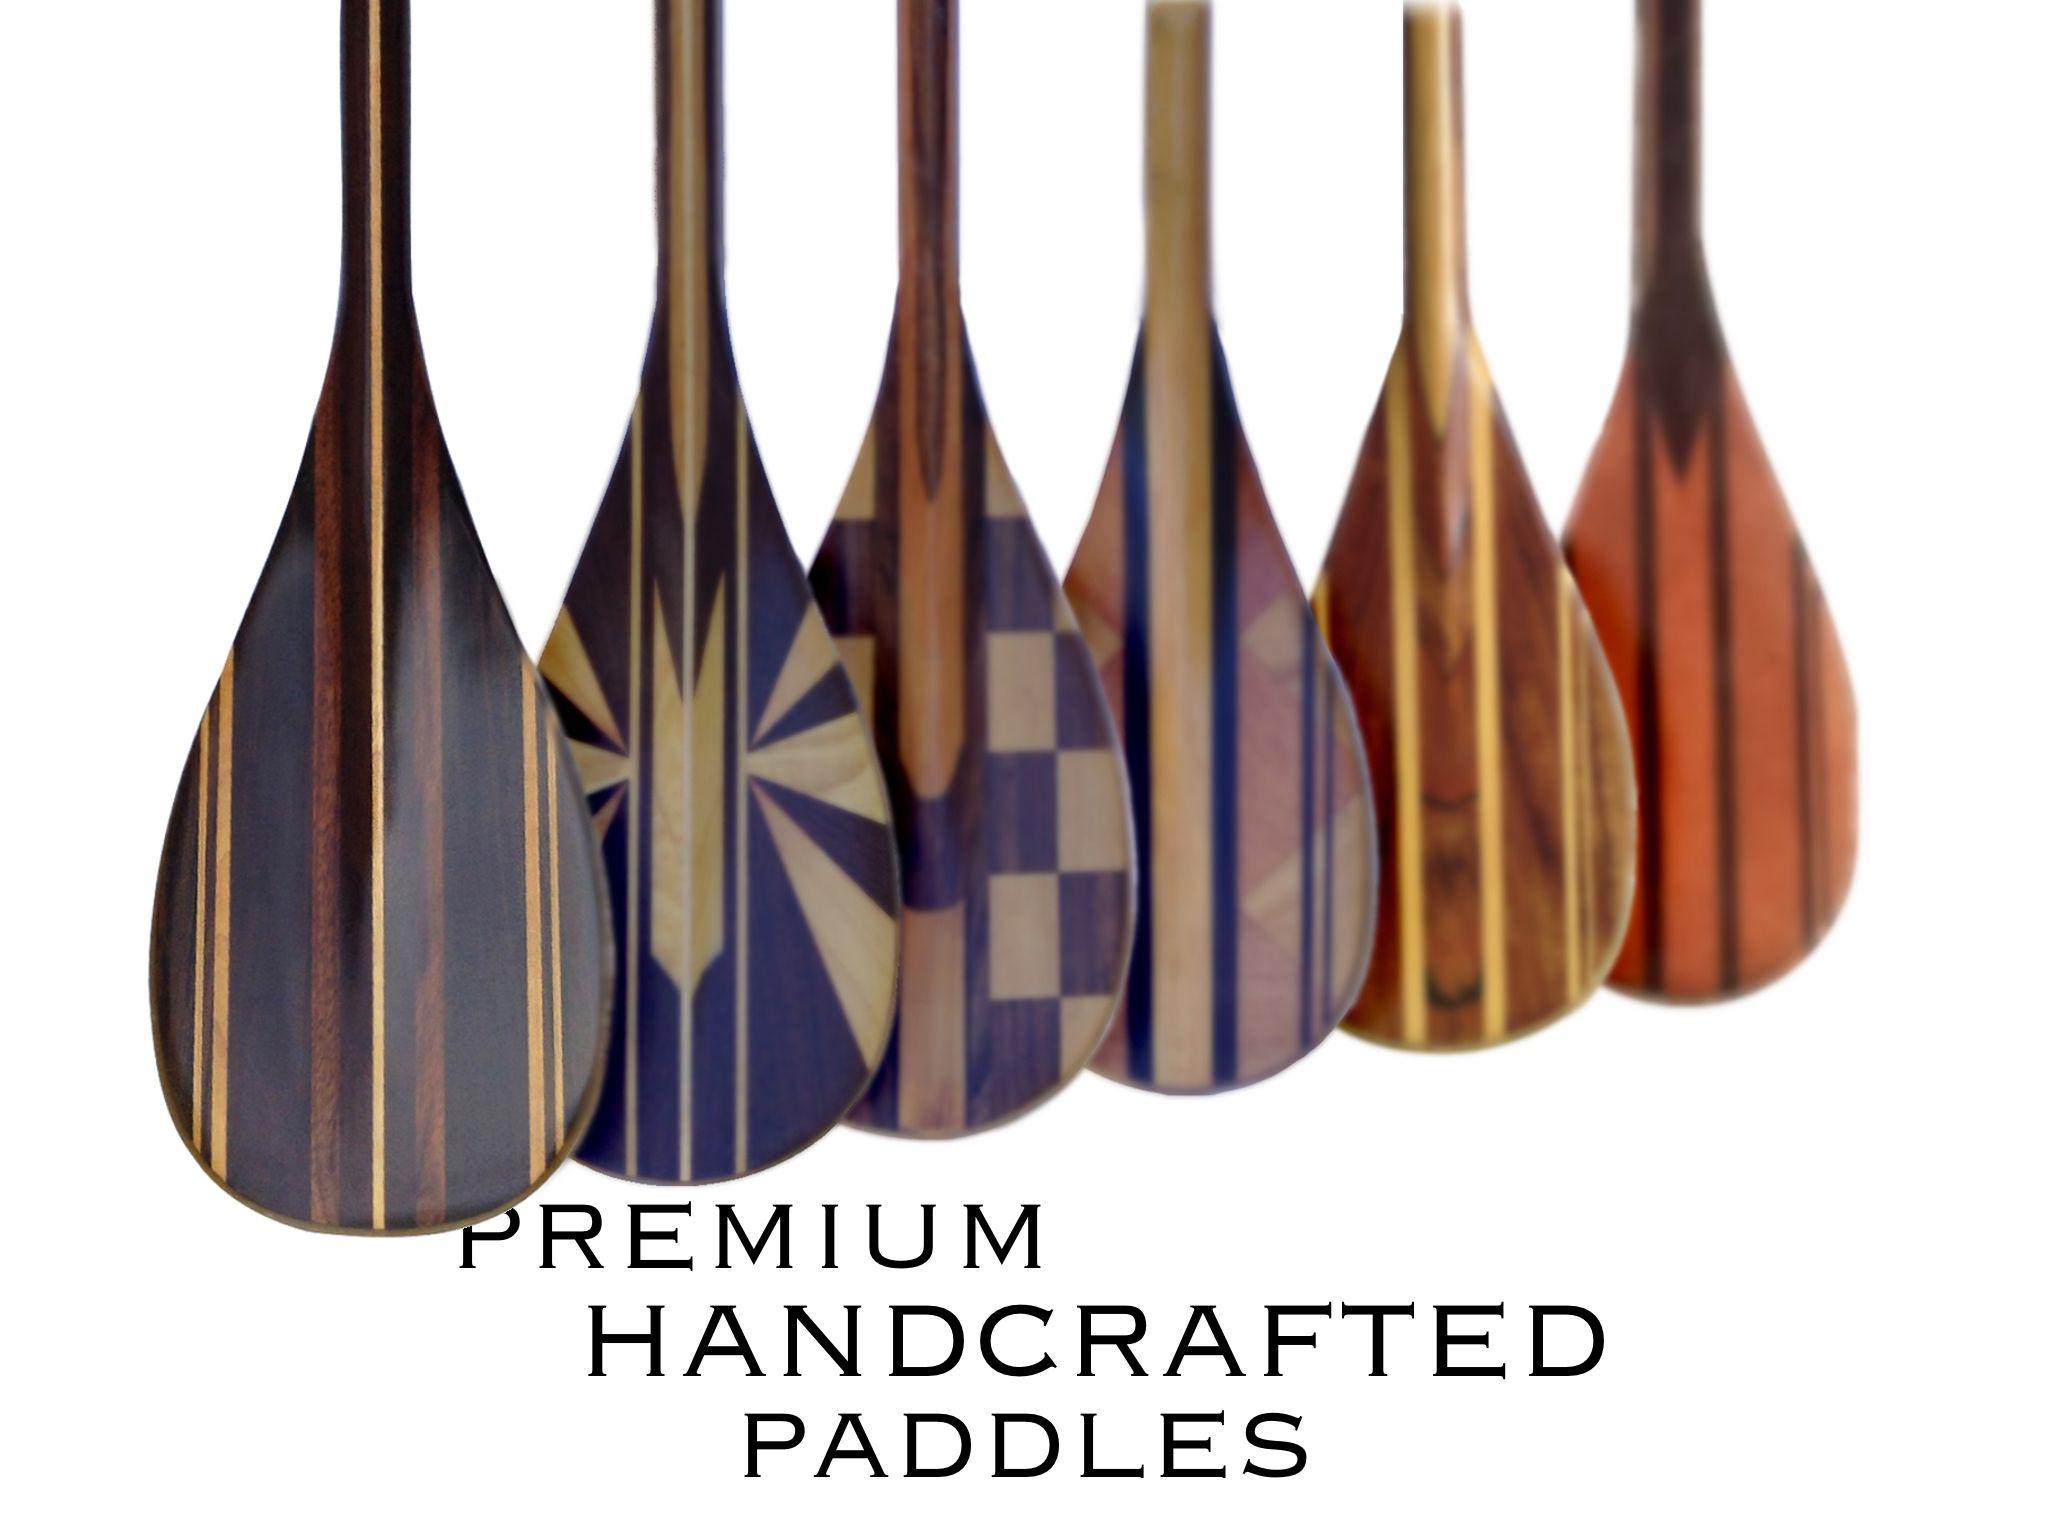 Deppen custom wood canoe paddles - Superior Sup And Canoe Paddles Deppen Paddles